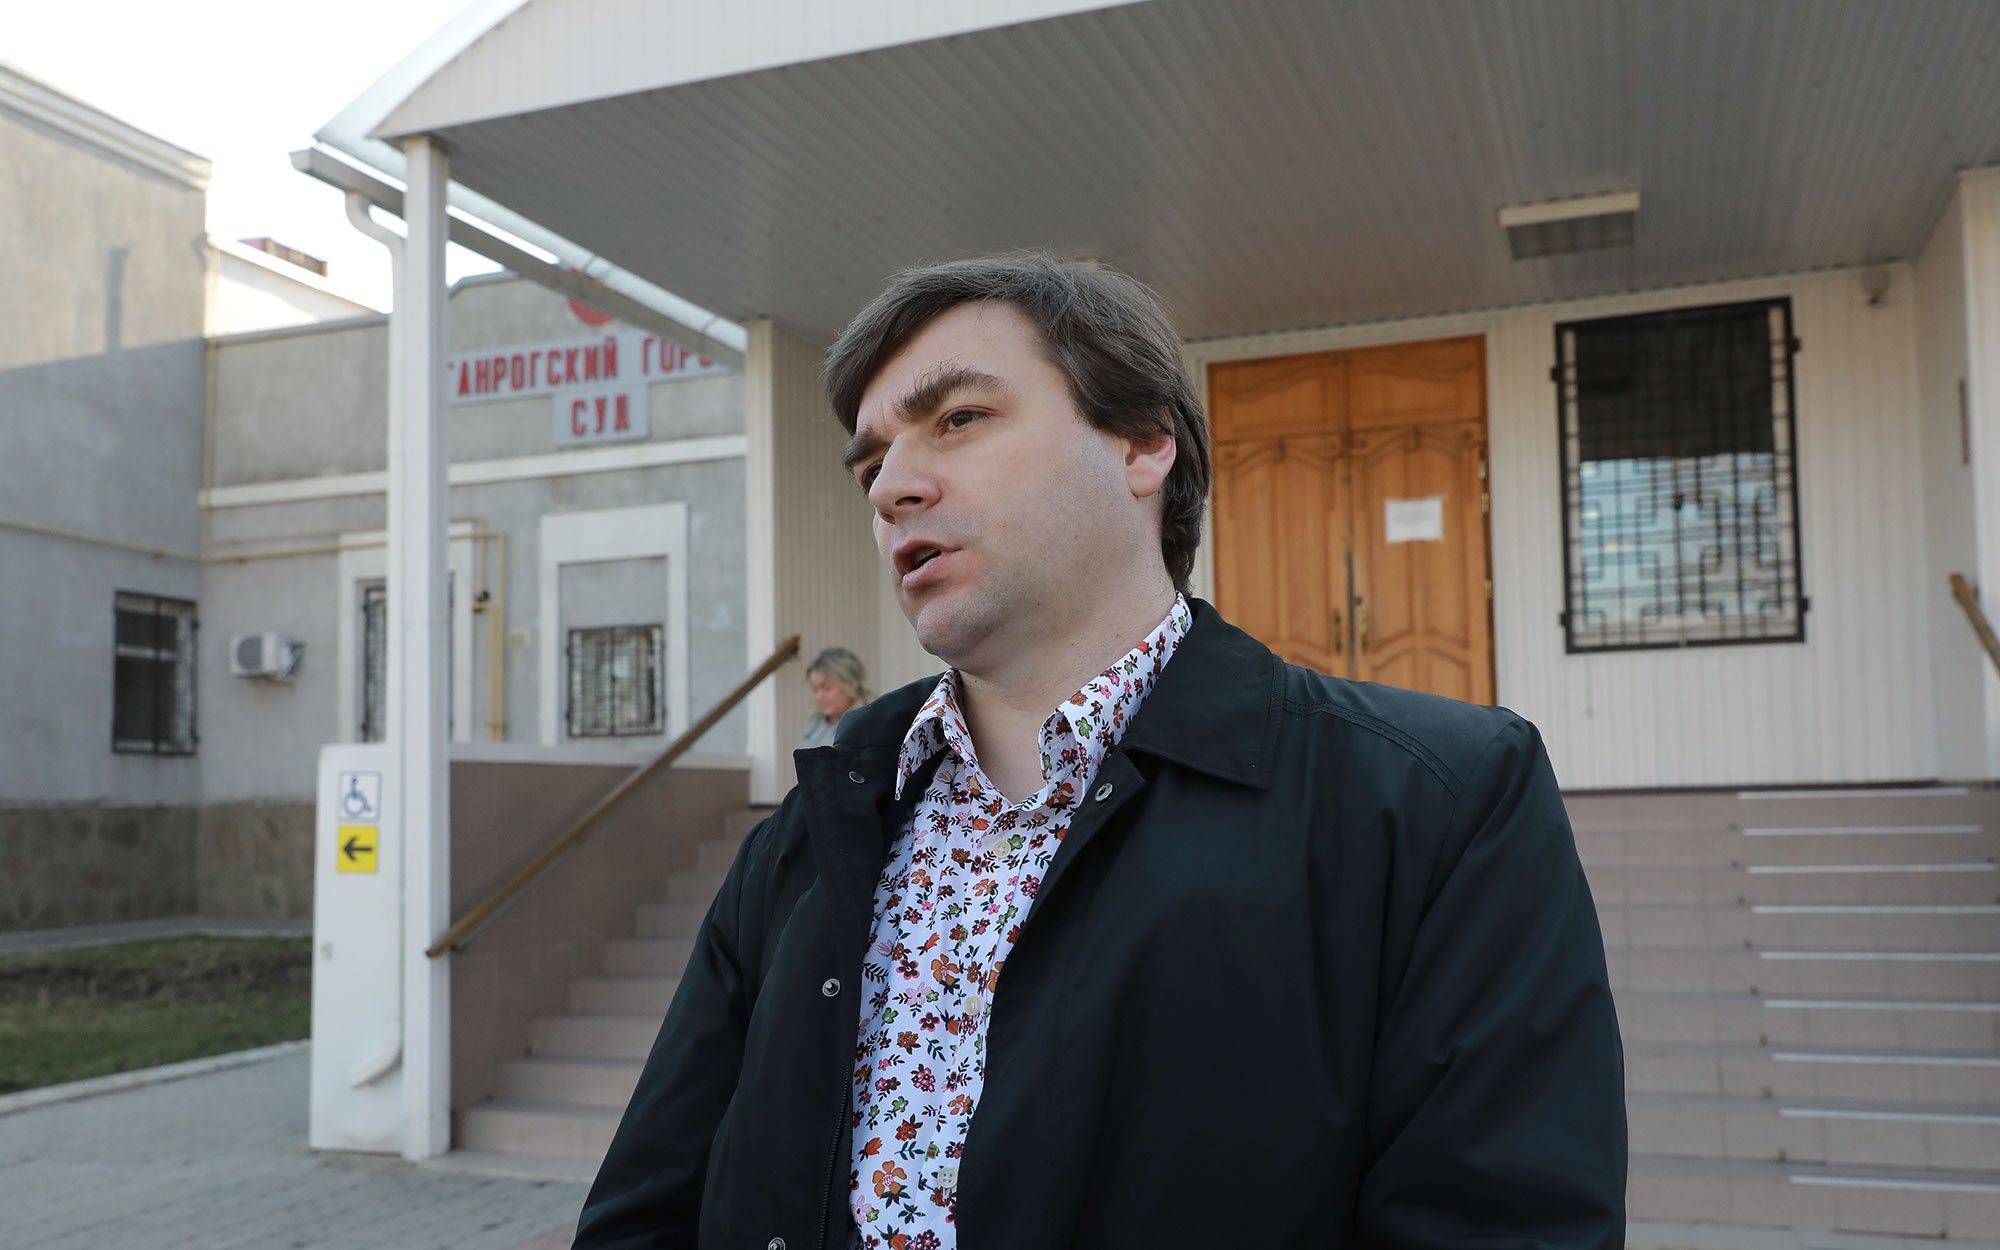 Адвокат Александр Попков. Фото: © L!FE / Сергей Дубровин